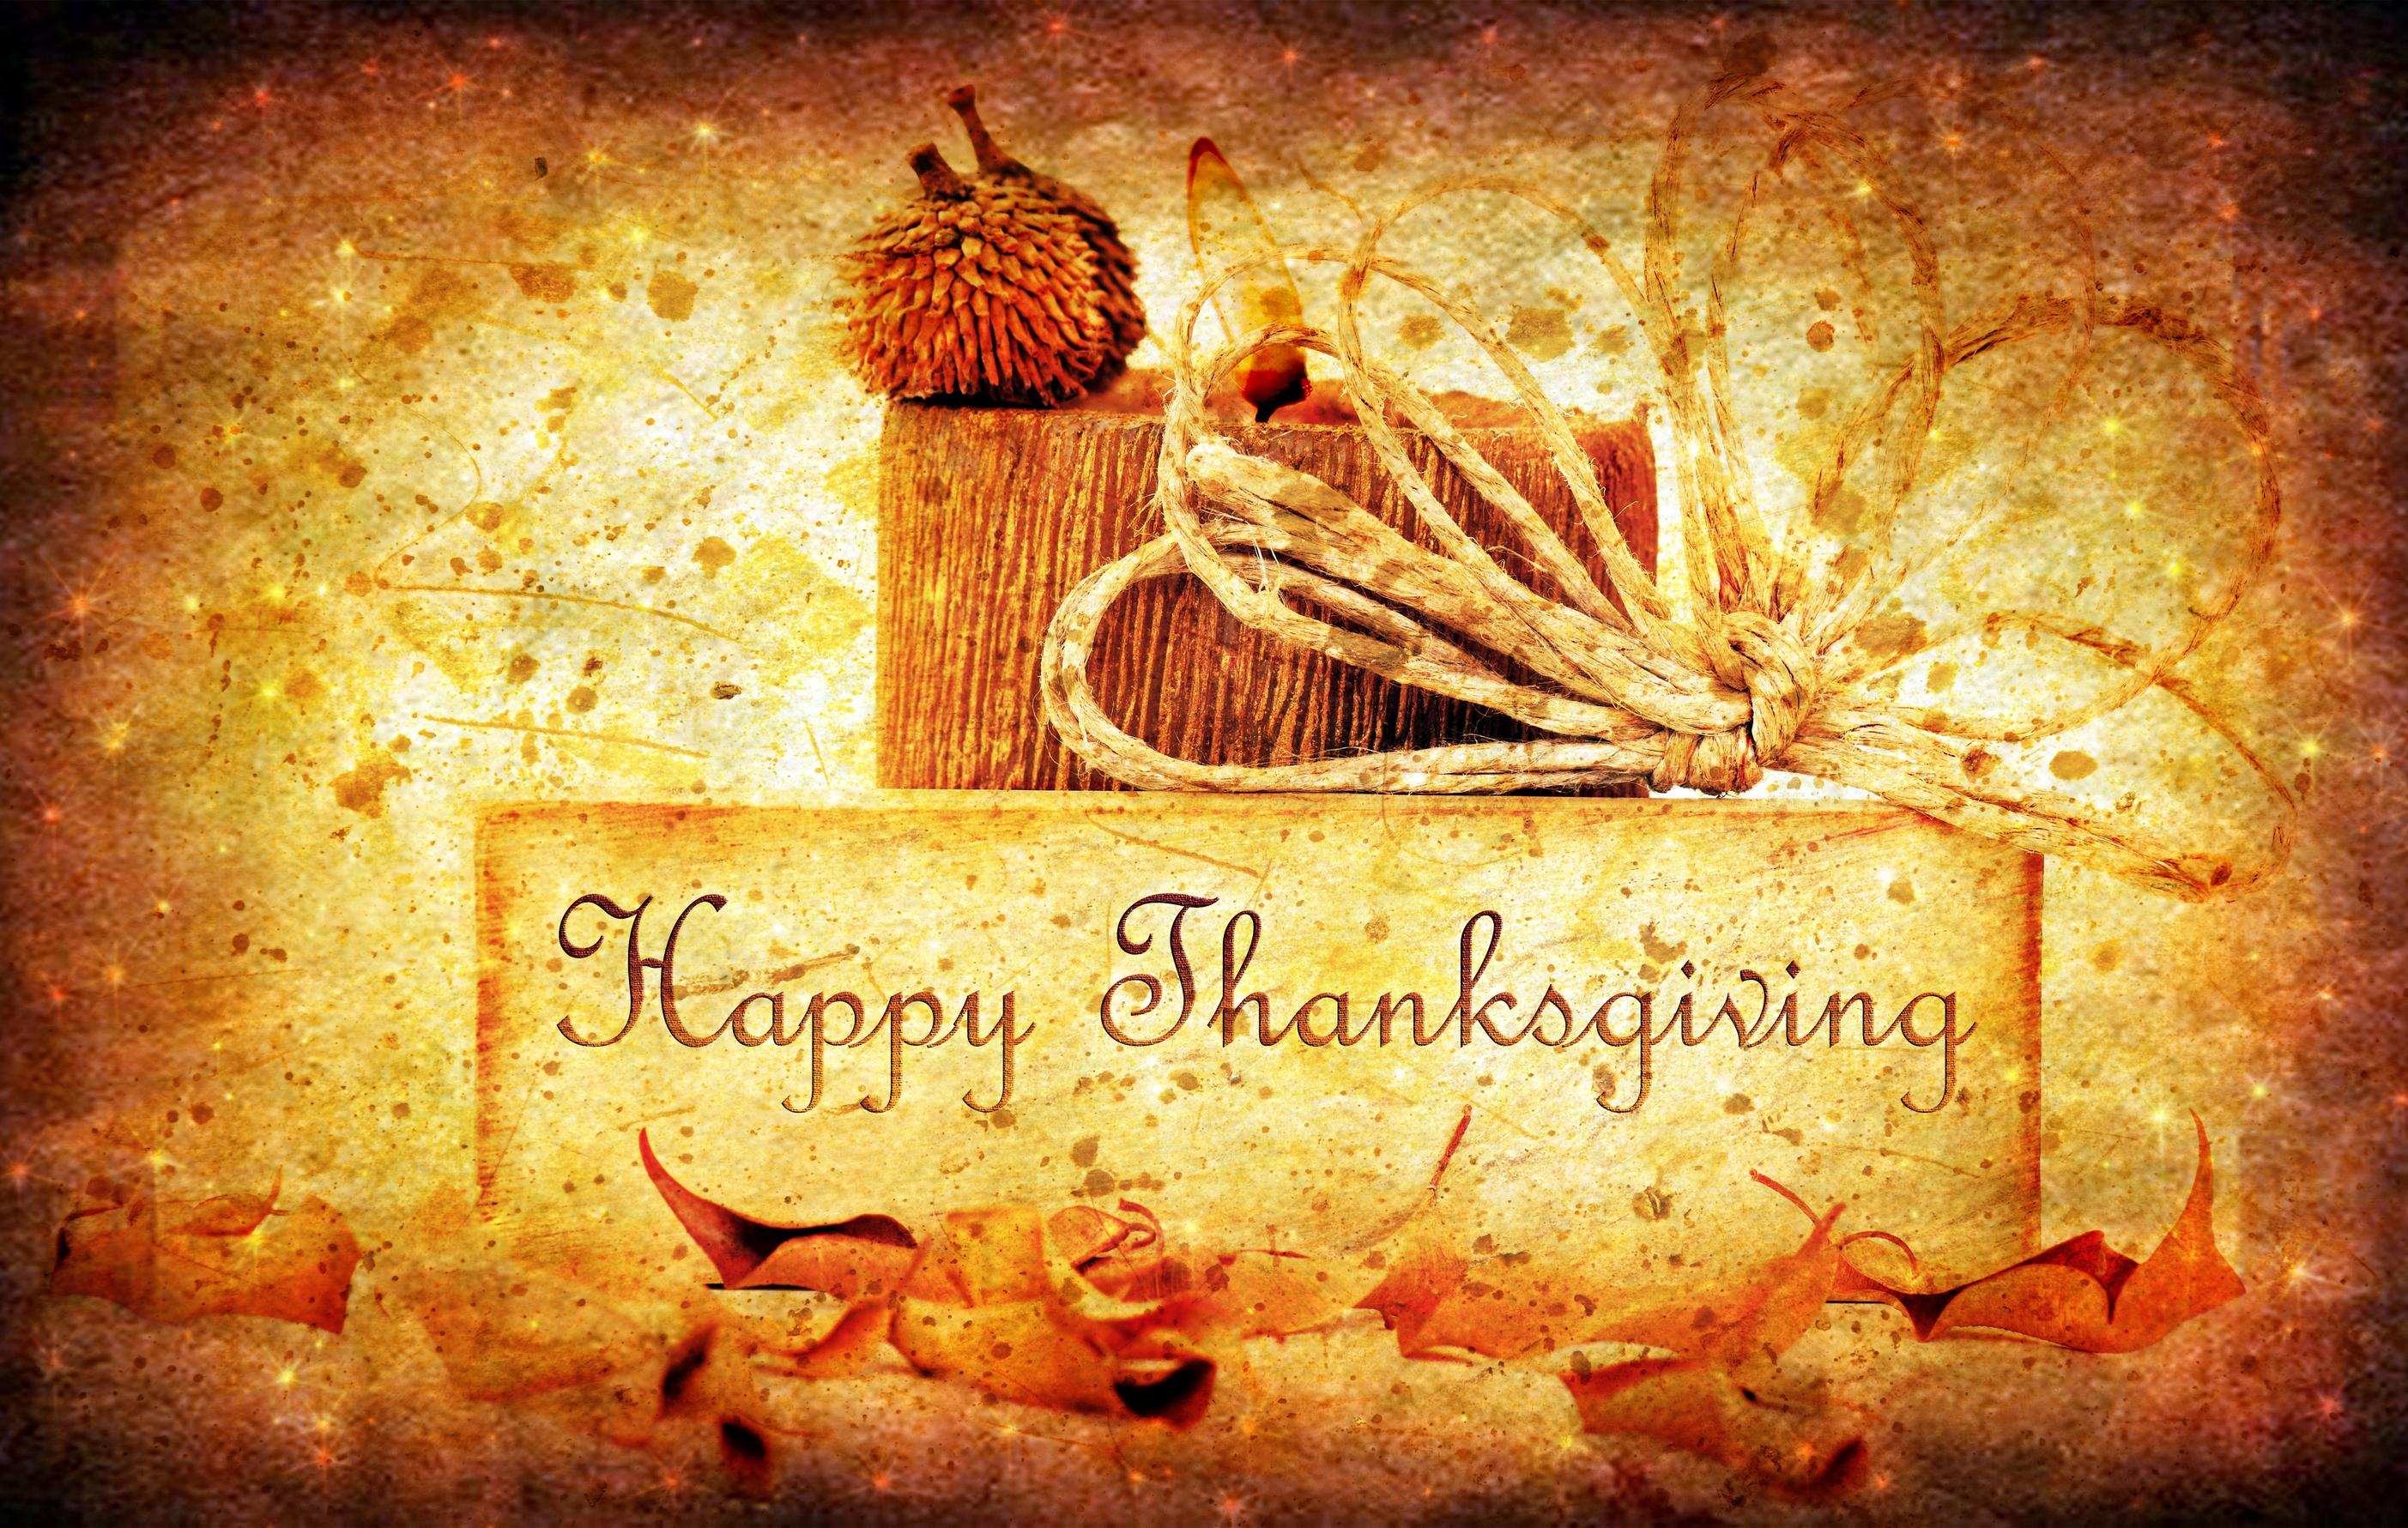 Thanksgiving Wallpaper HD Download 2018 2806x1781